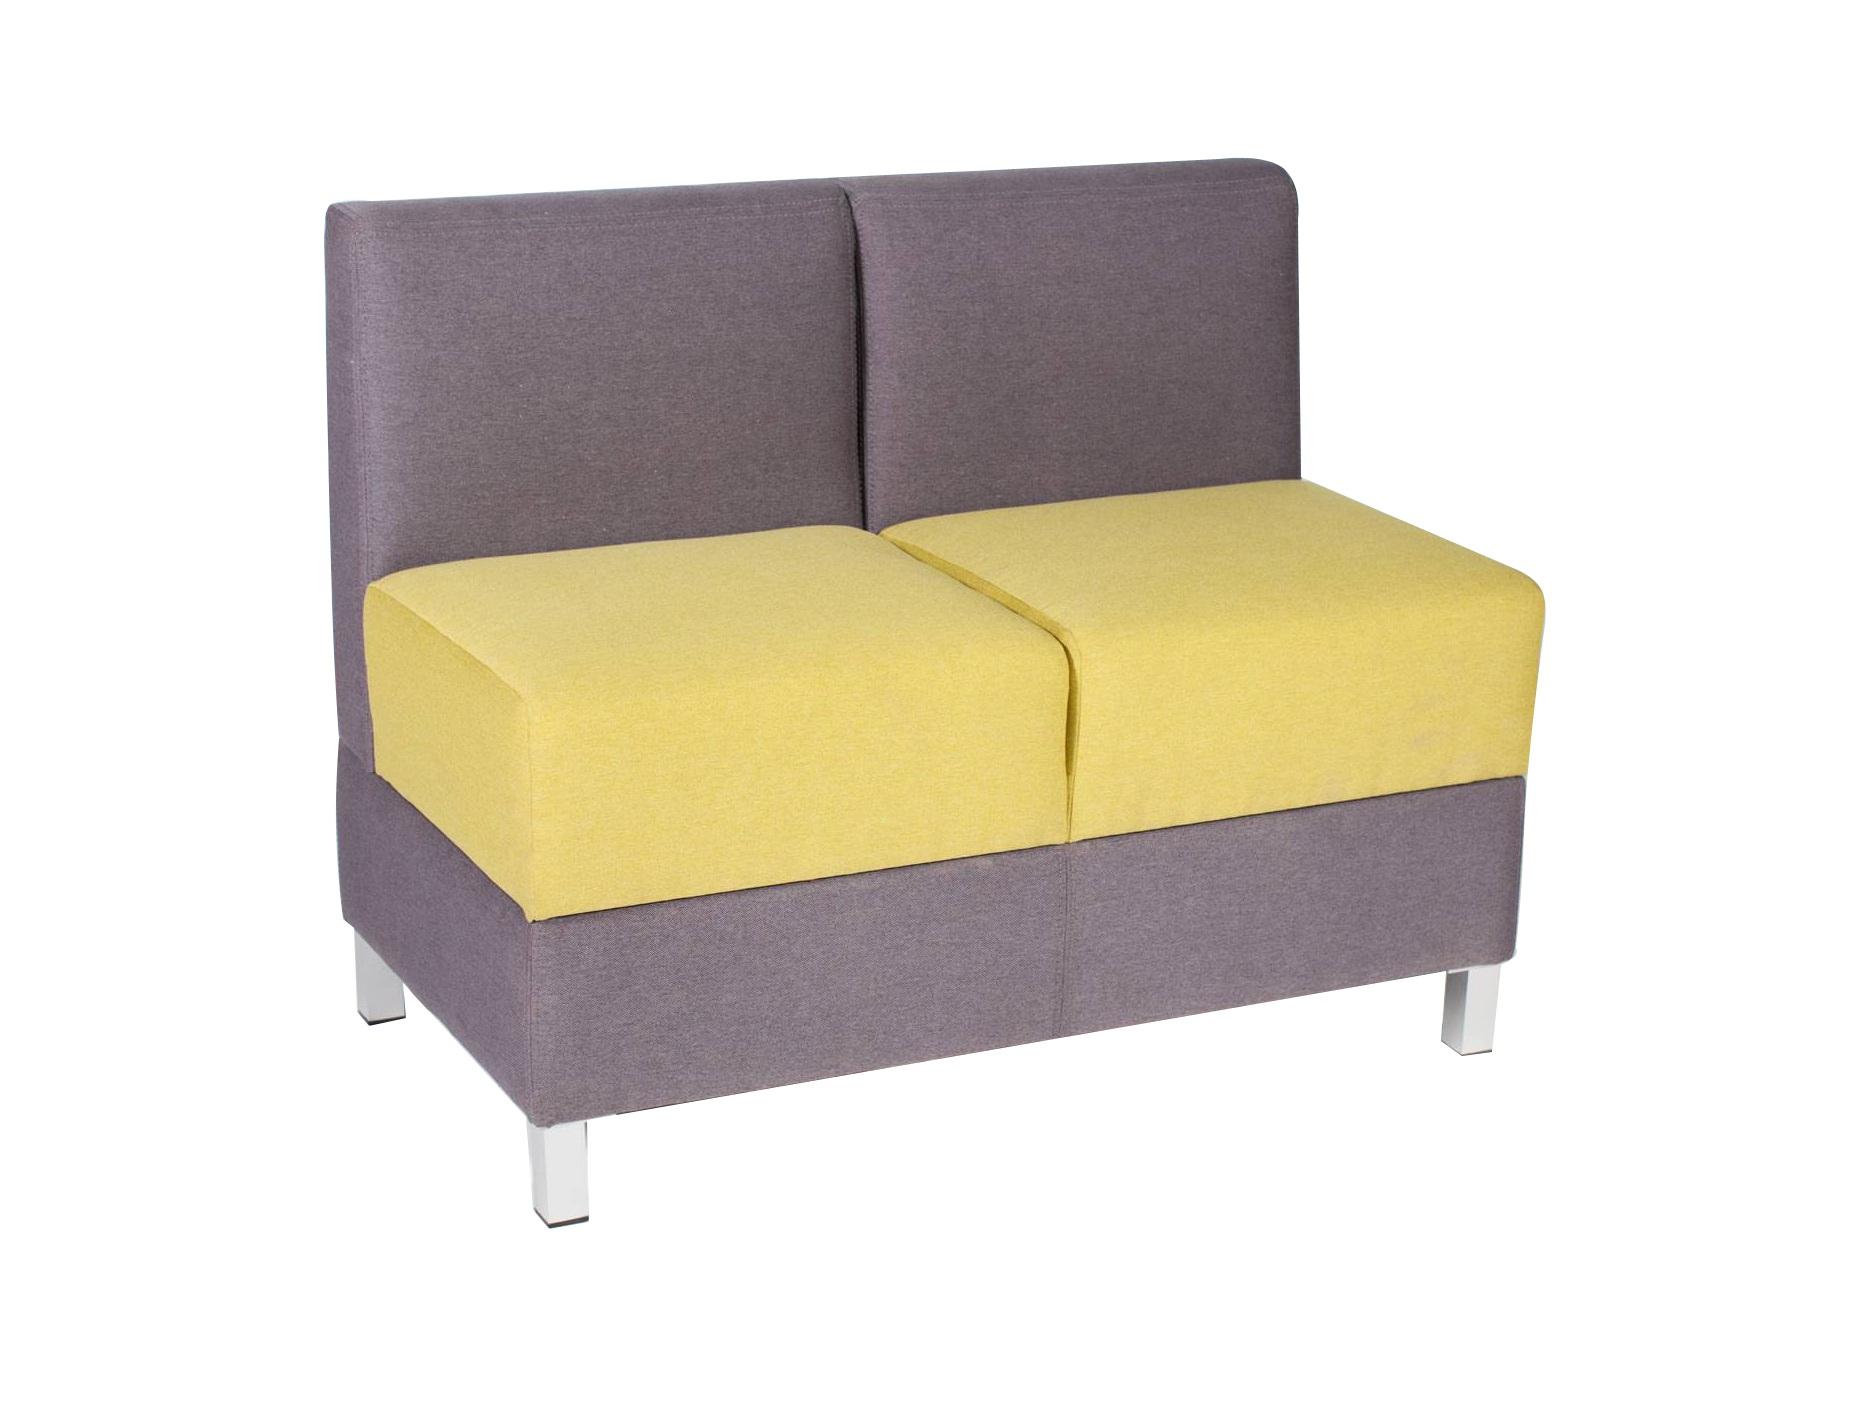 Модульный диван Лион 2-х местный